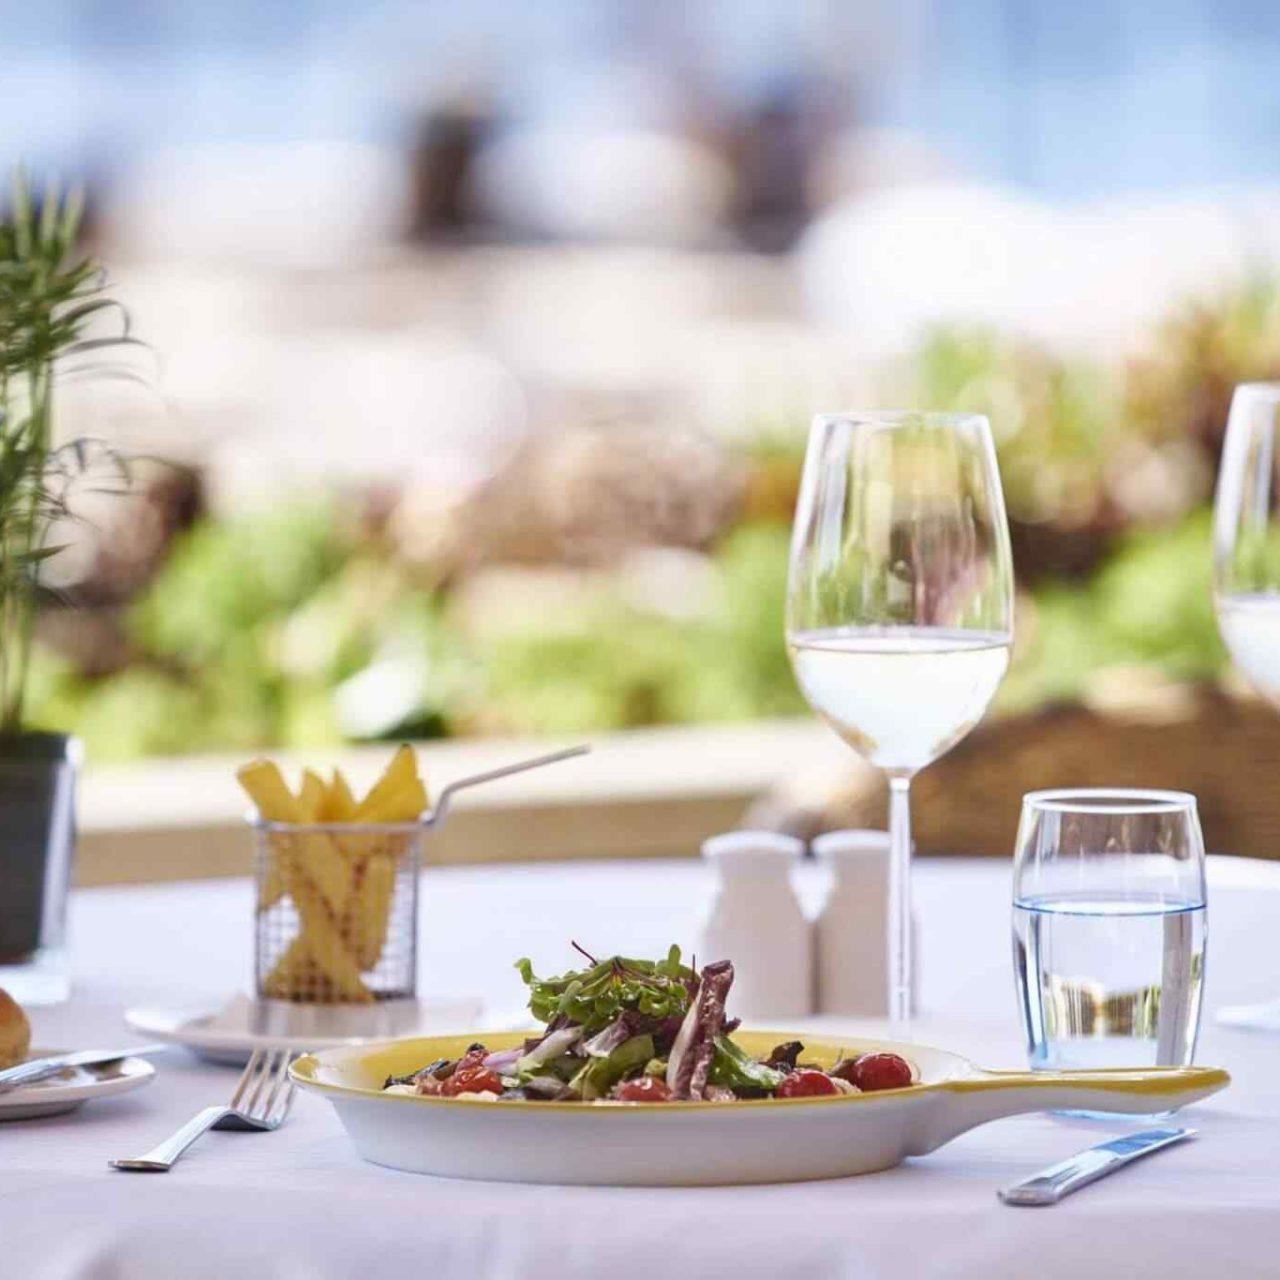 https://guiaturismochile.cl/wp-content/uploads/2017/08/restaurant-01-6-1-1280x1280.jpg